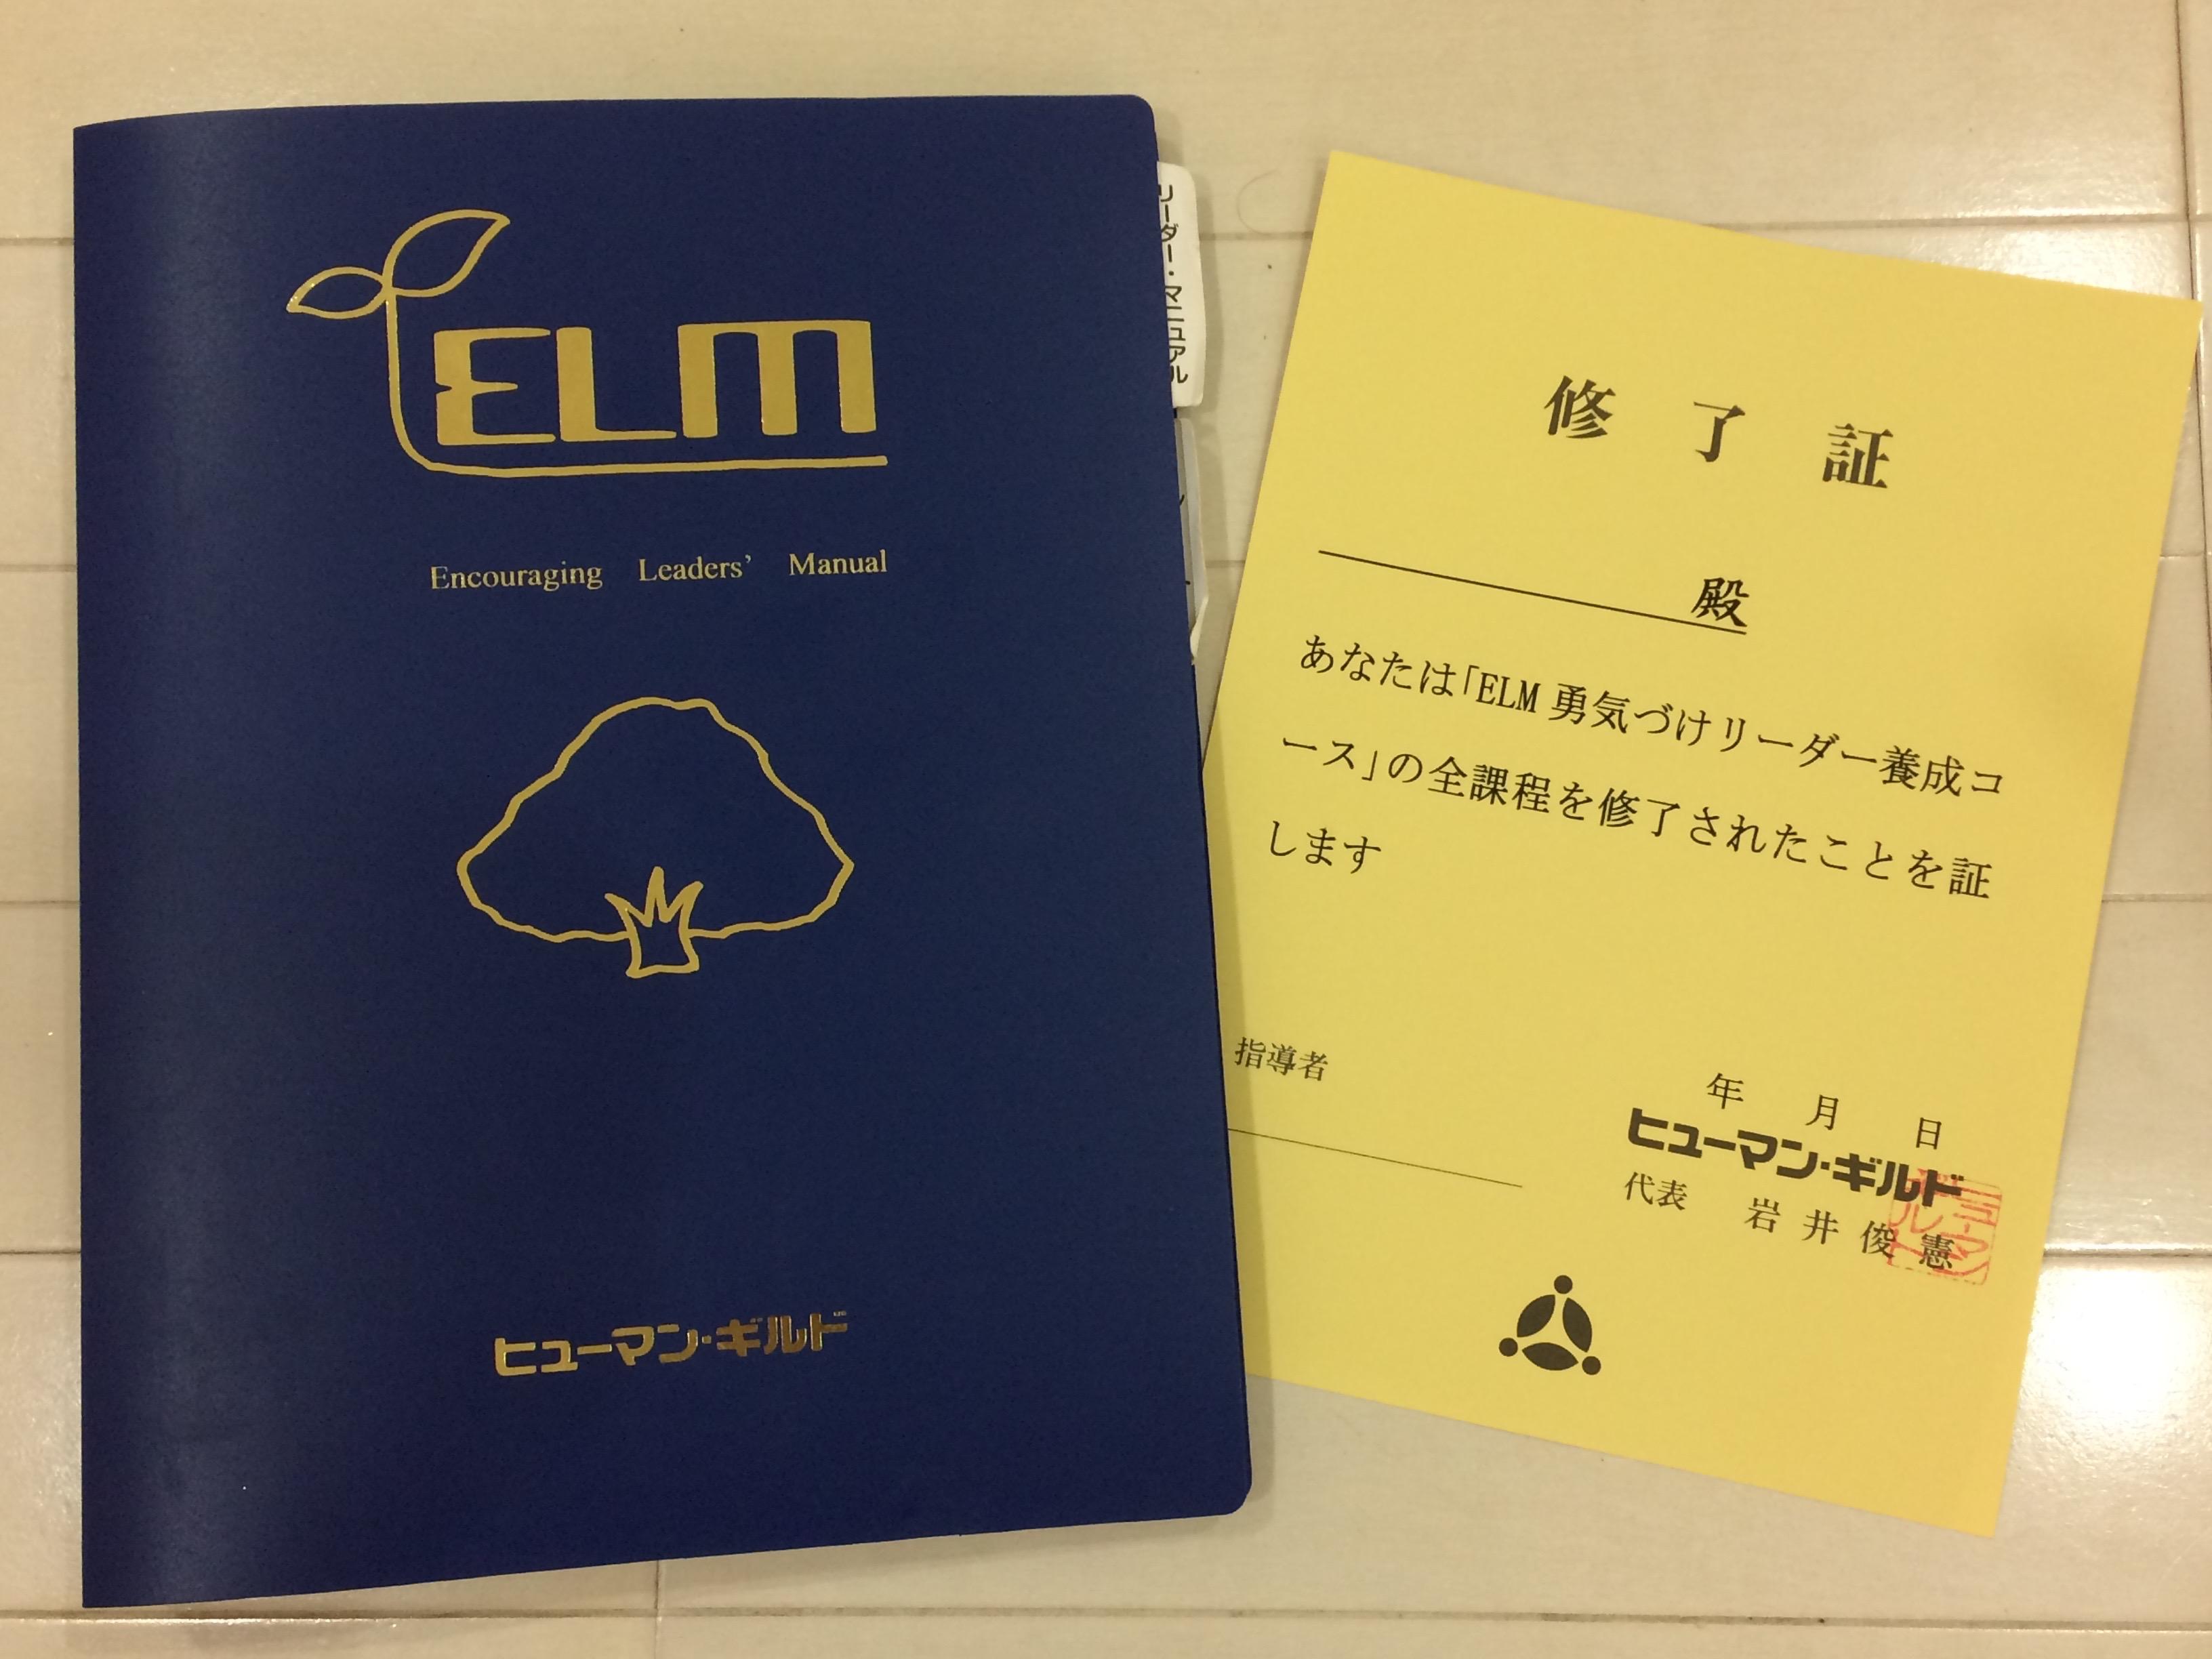 coucou touch - クークータッチ|コミュニケーション講座『ELM(エルム)』の修了証